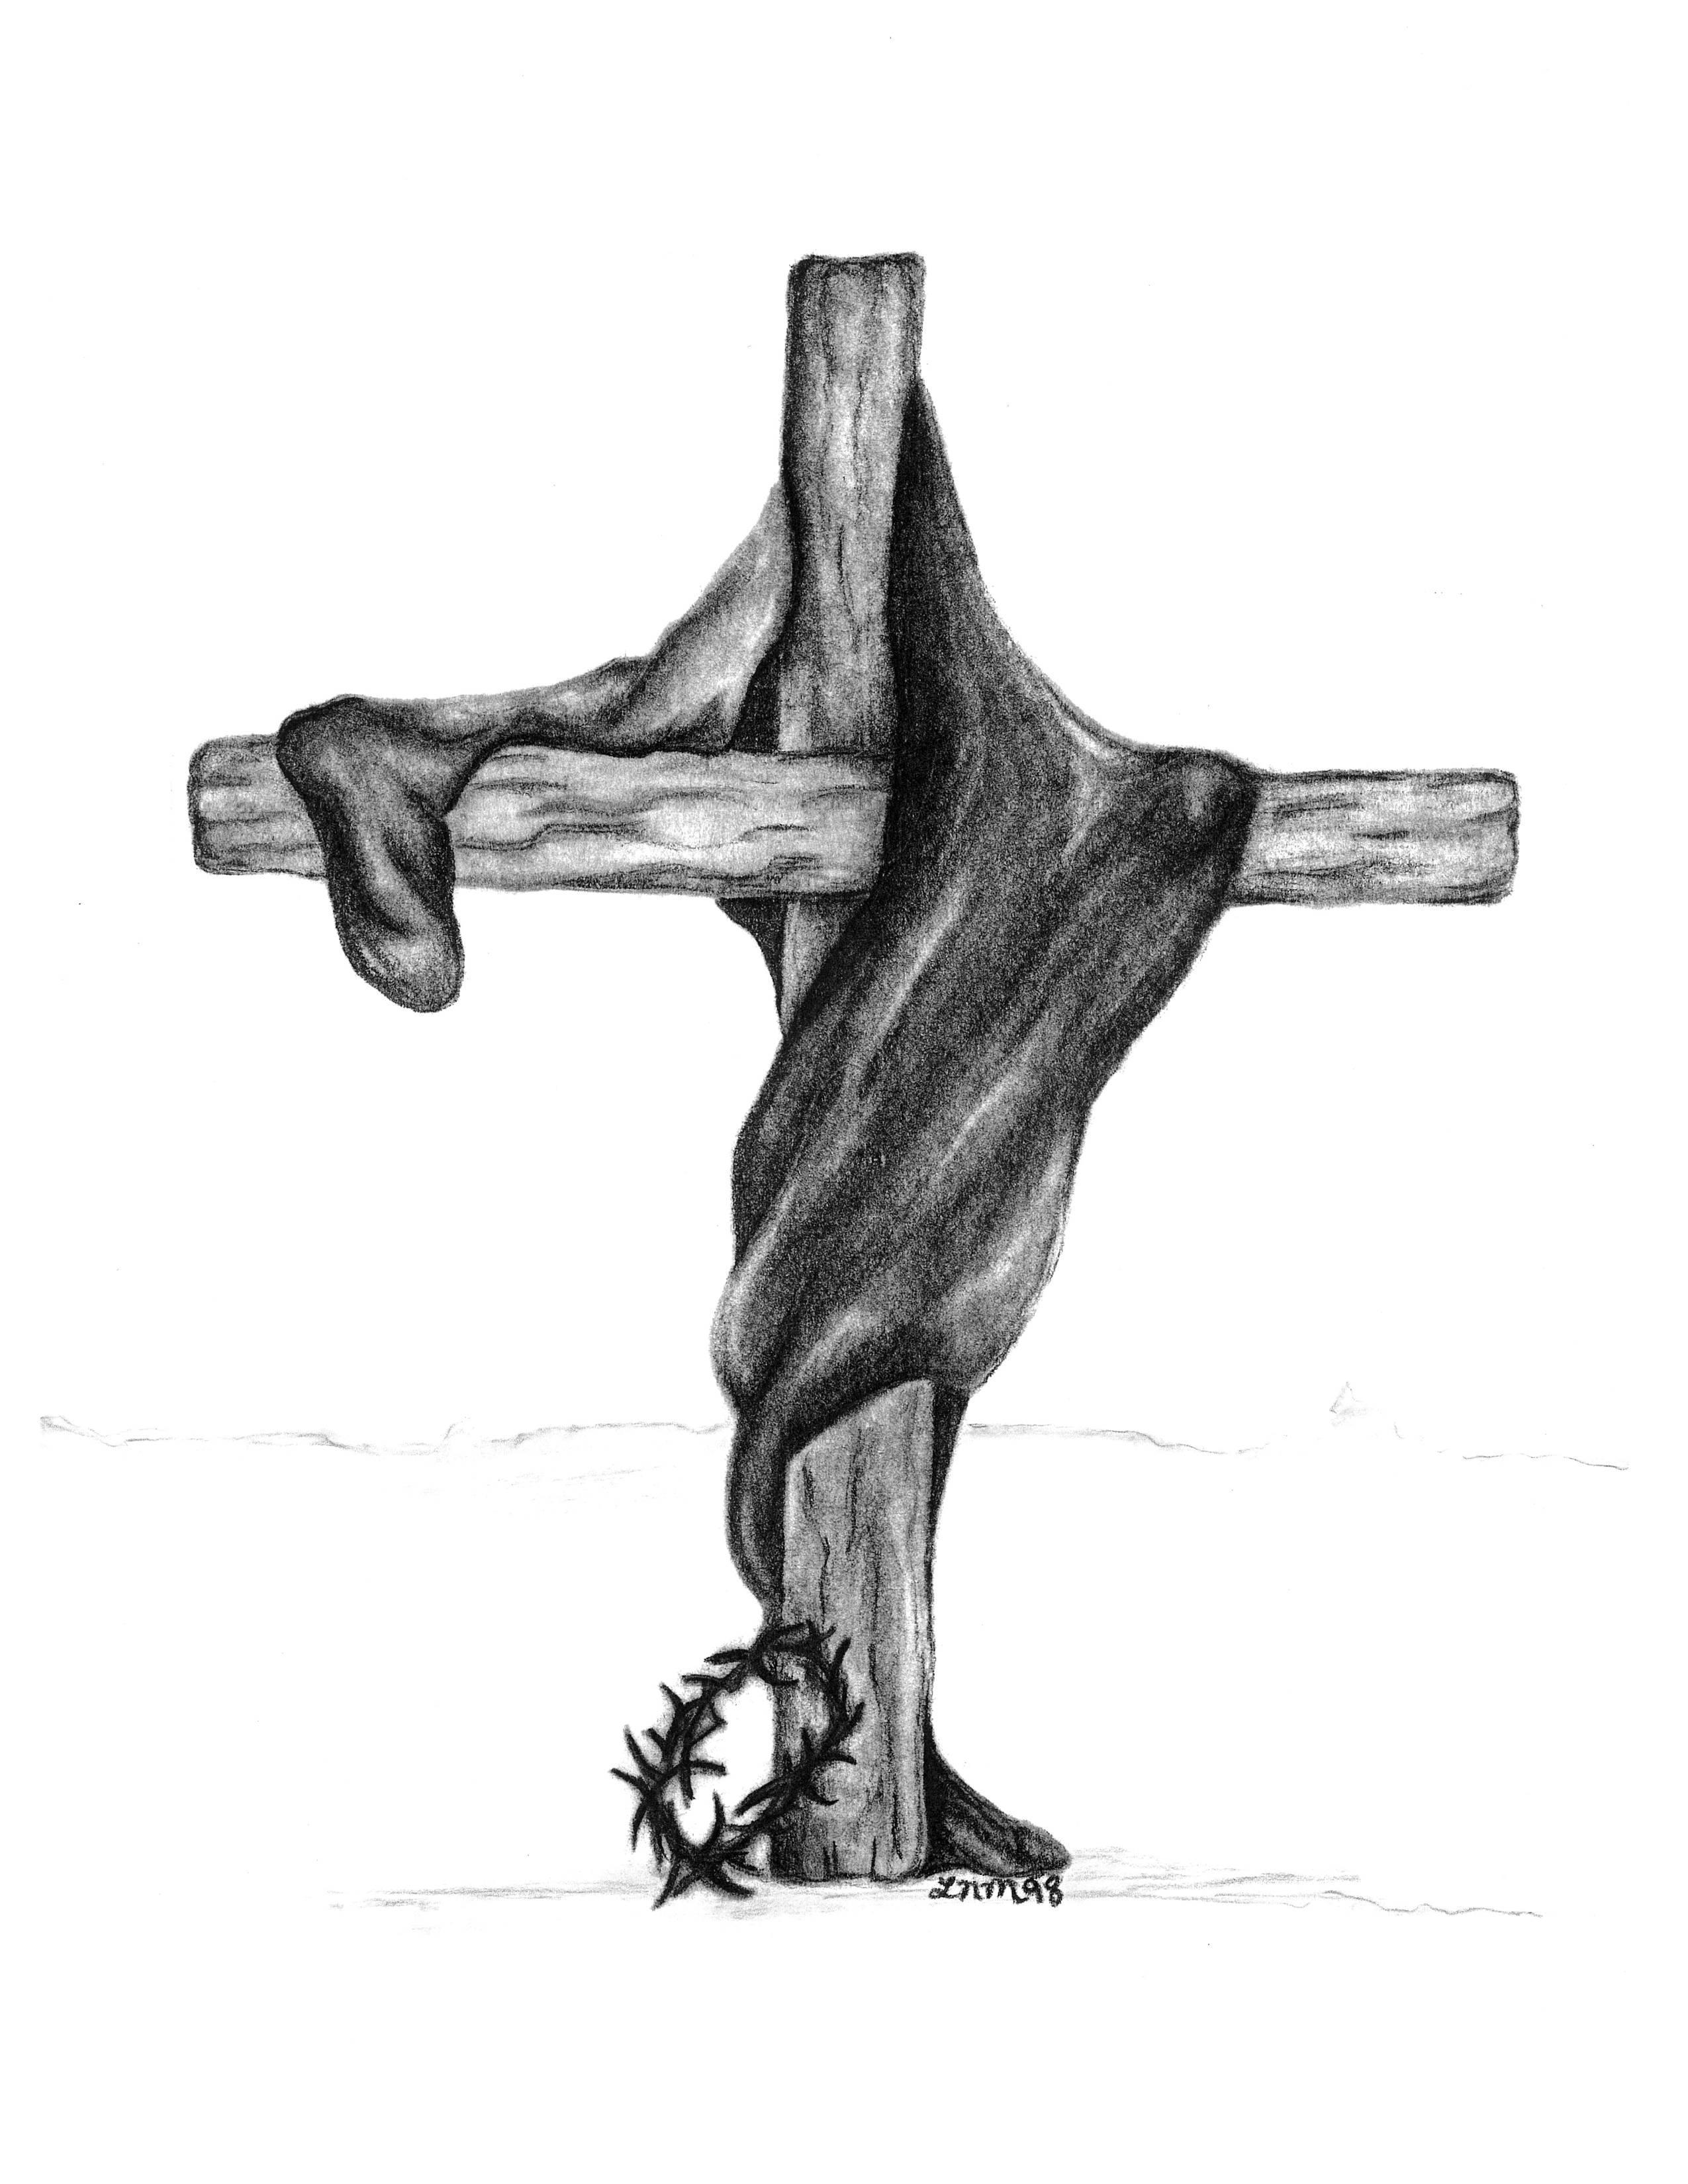 Robe on the Cross 1